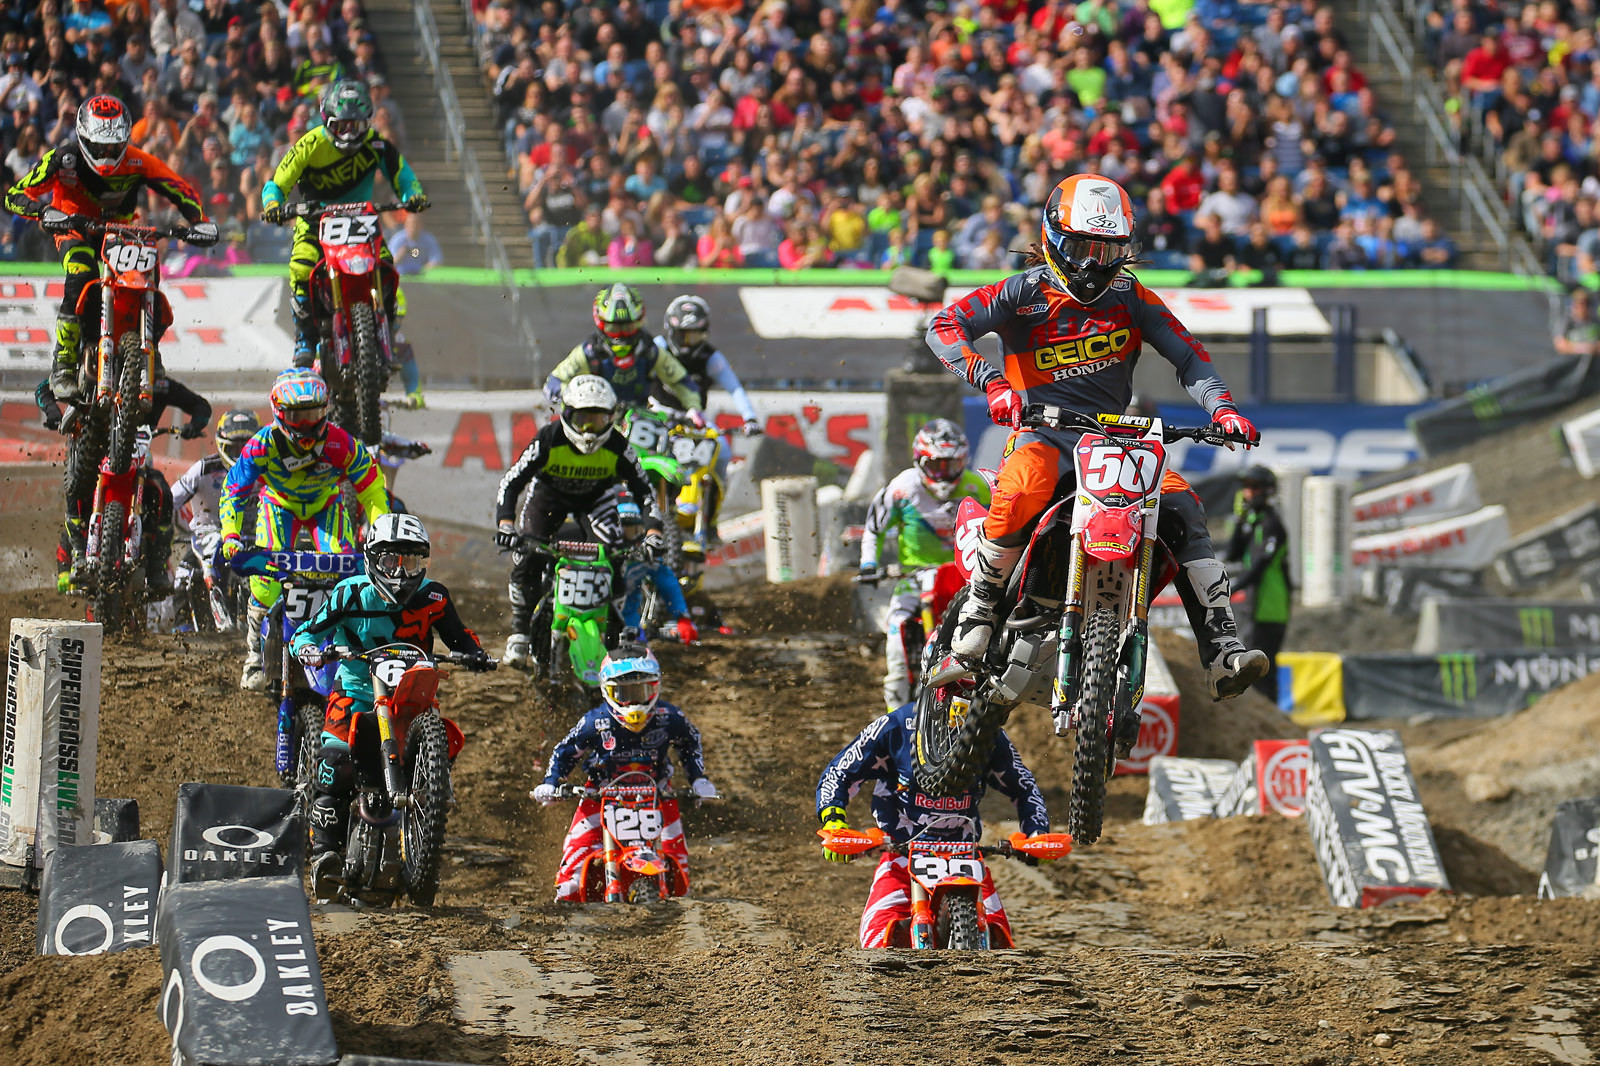 250 Heat Race One - GuyB - Motocross Pictures - Vital MX